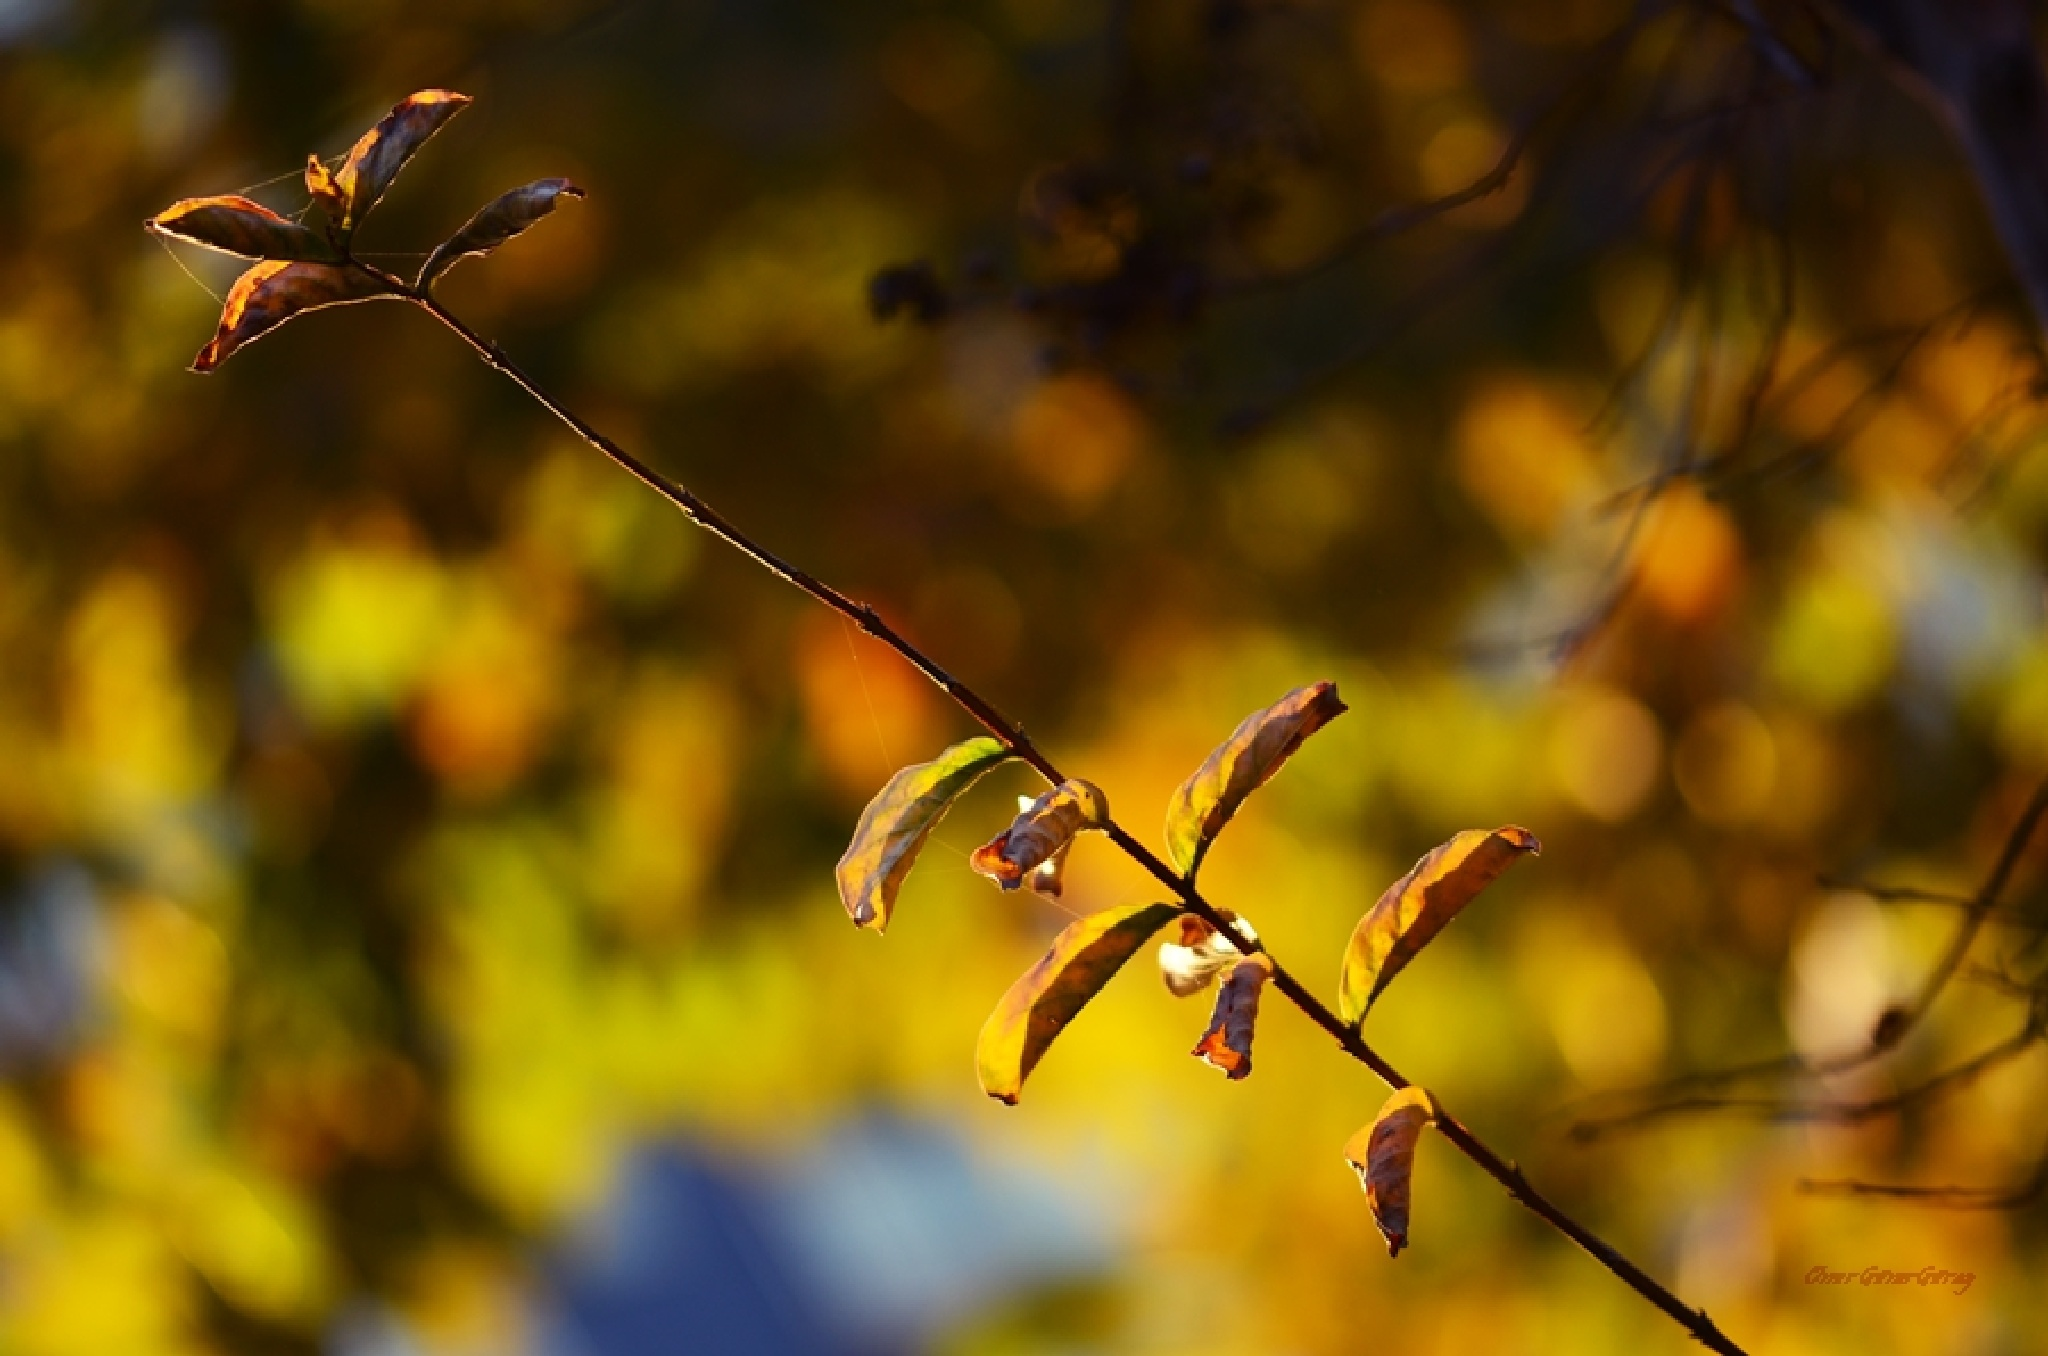 Sonbahar Işığı by Onur Güner Güray